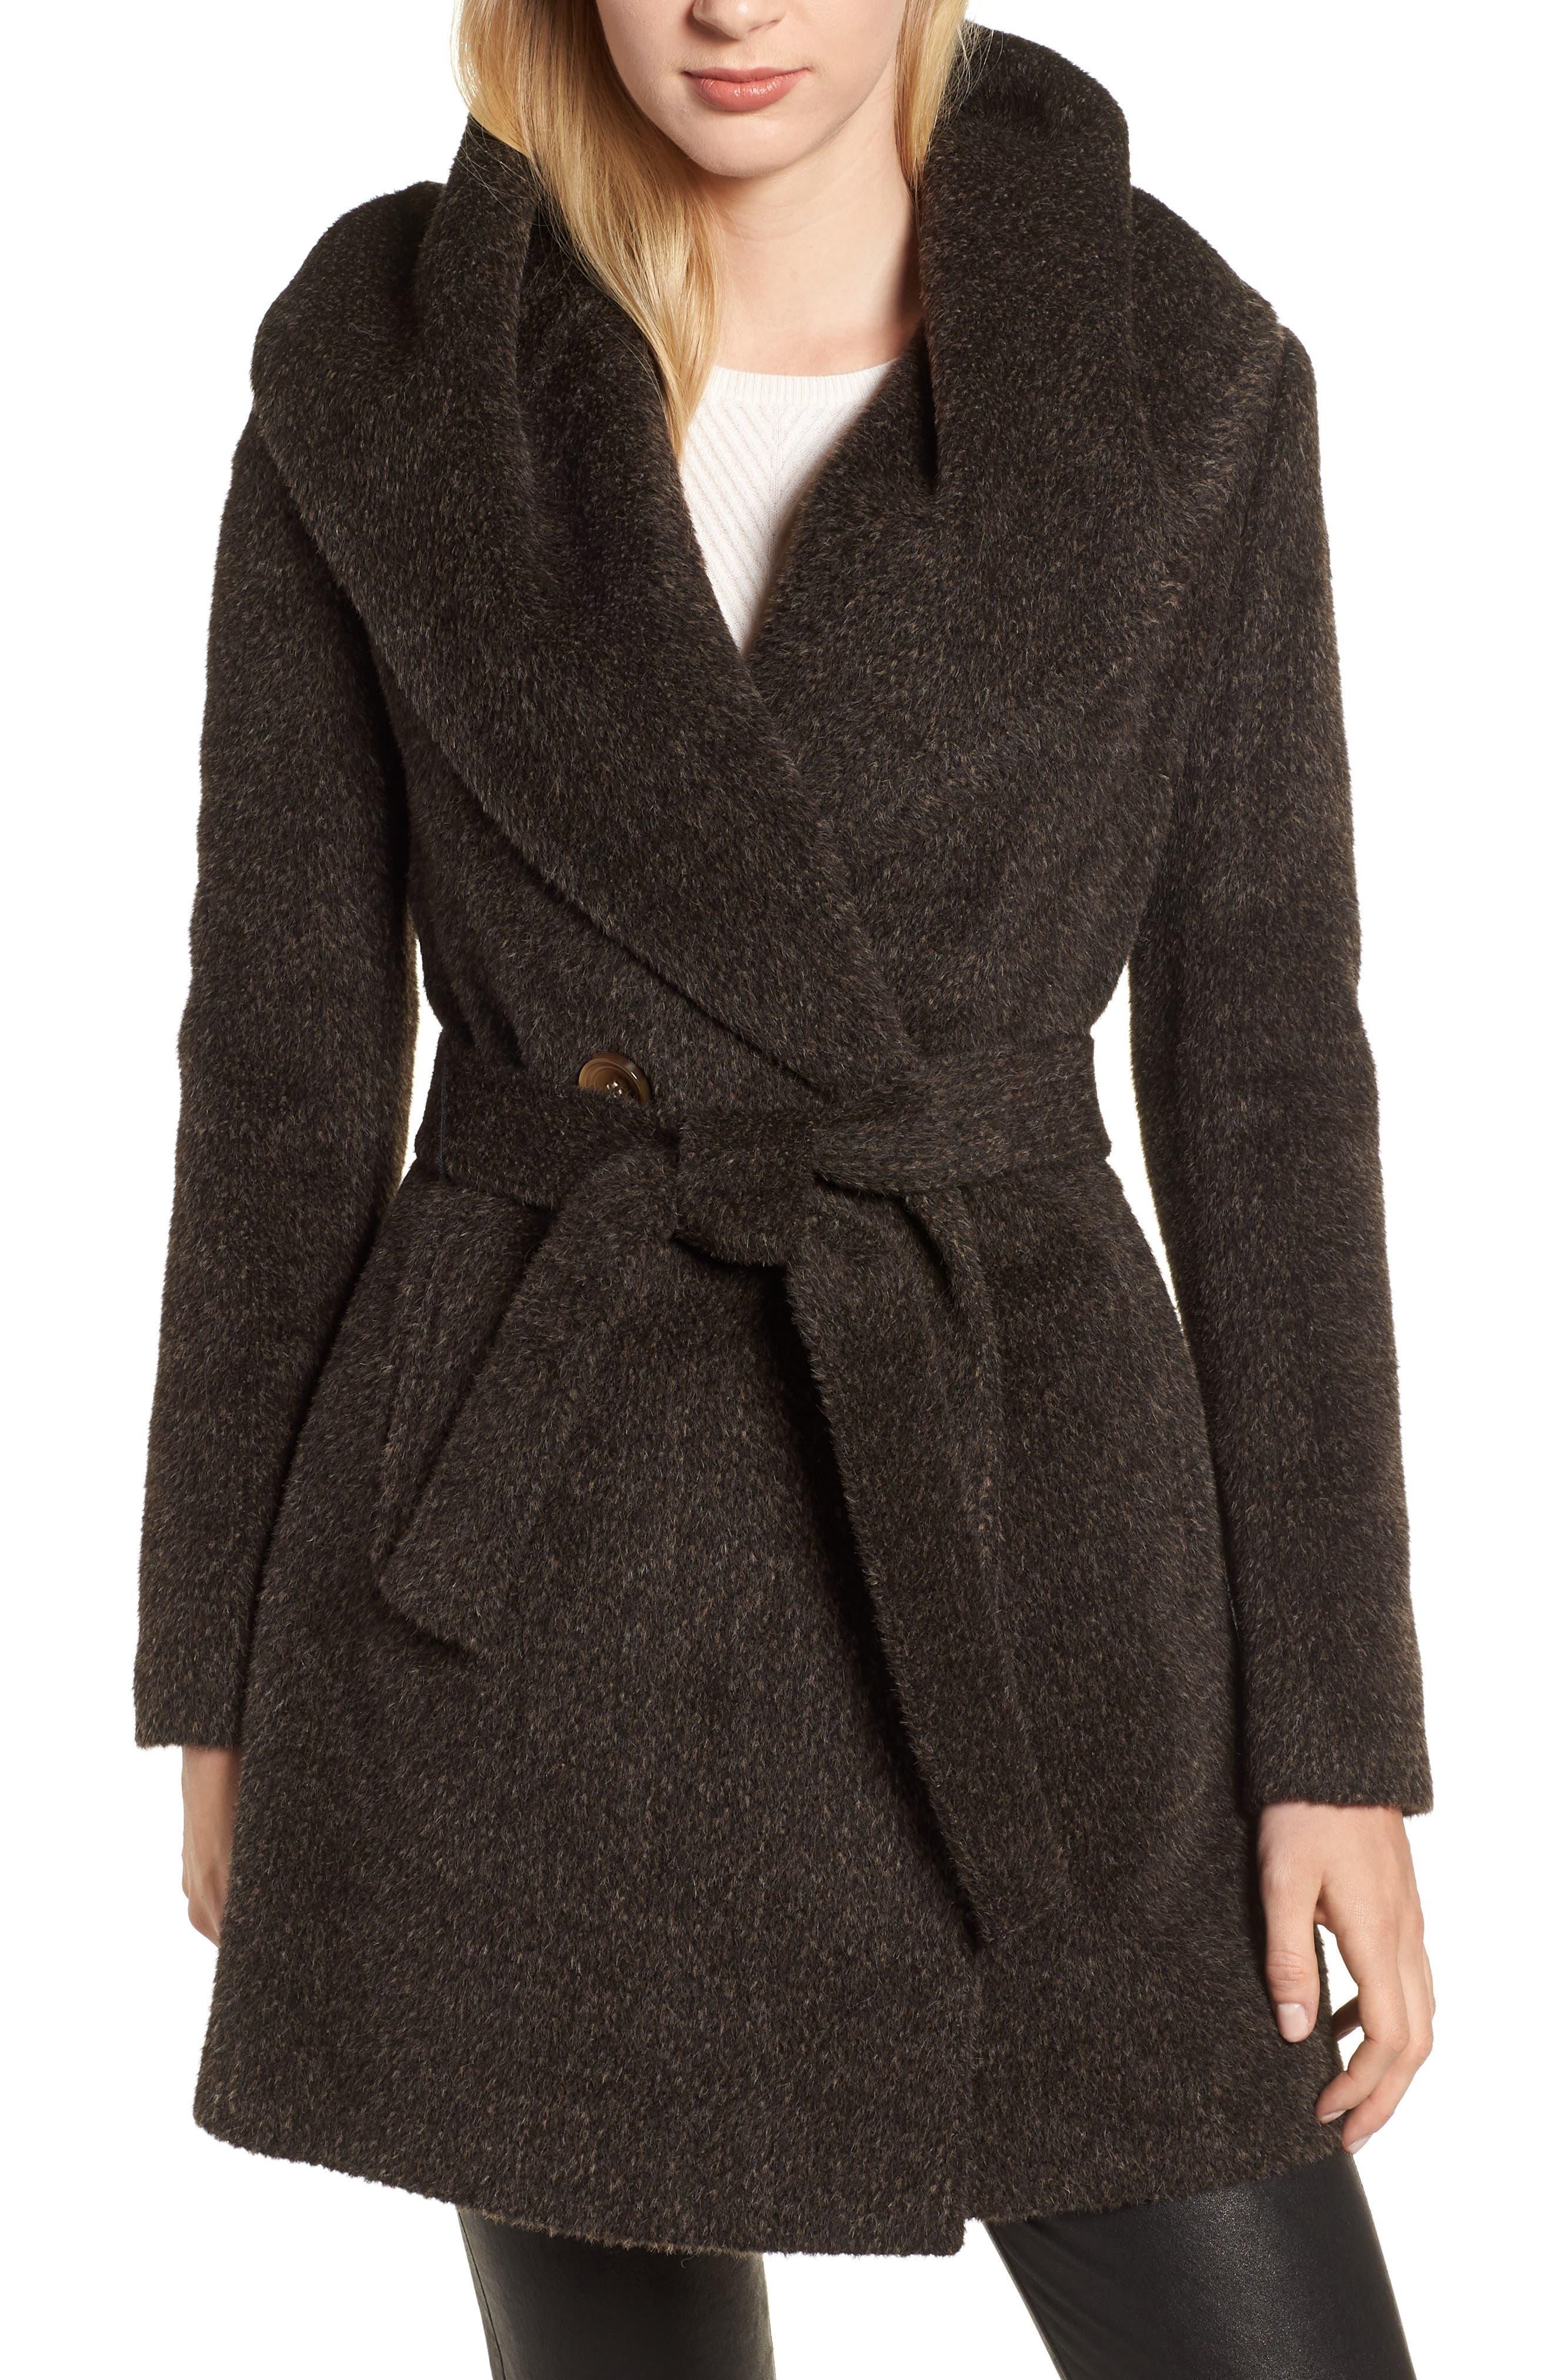 Grace Hooded Wrap Walker Coat,                         Main,                         color, BROWN/ BLACK